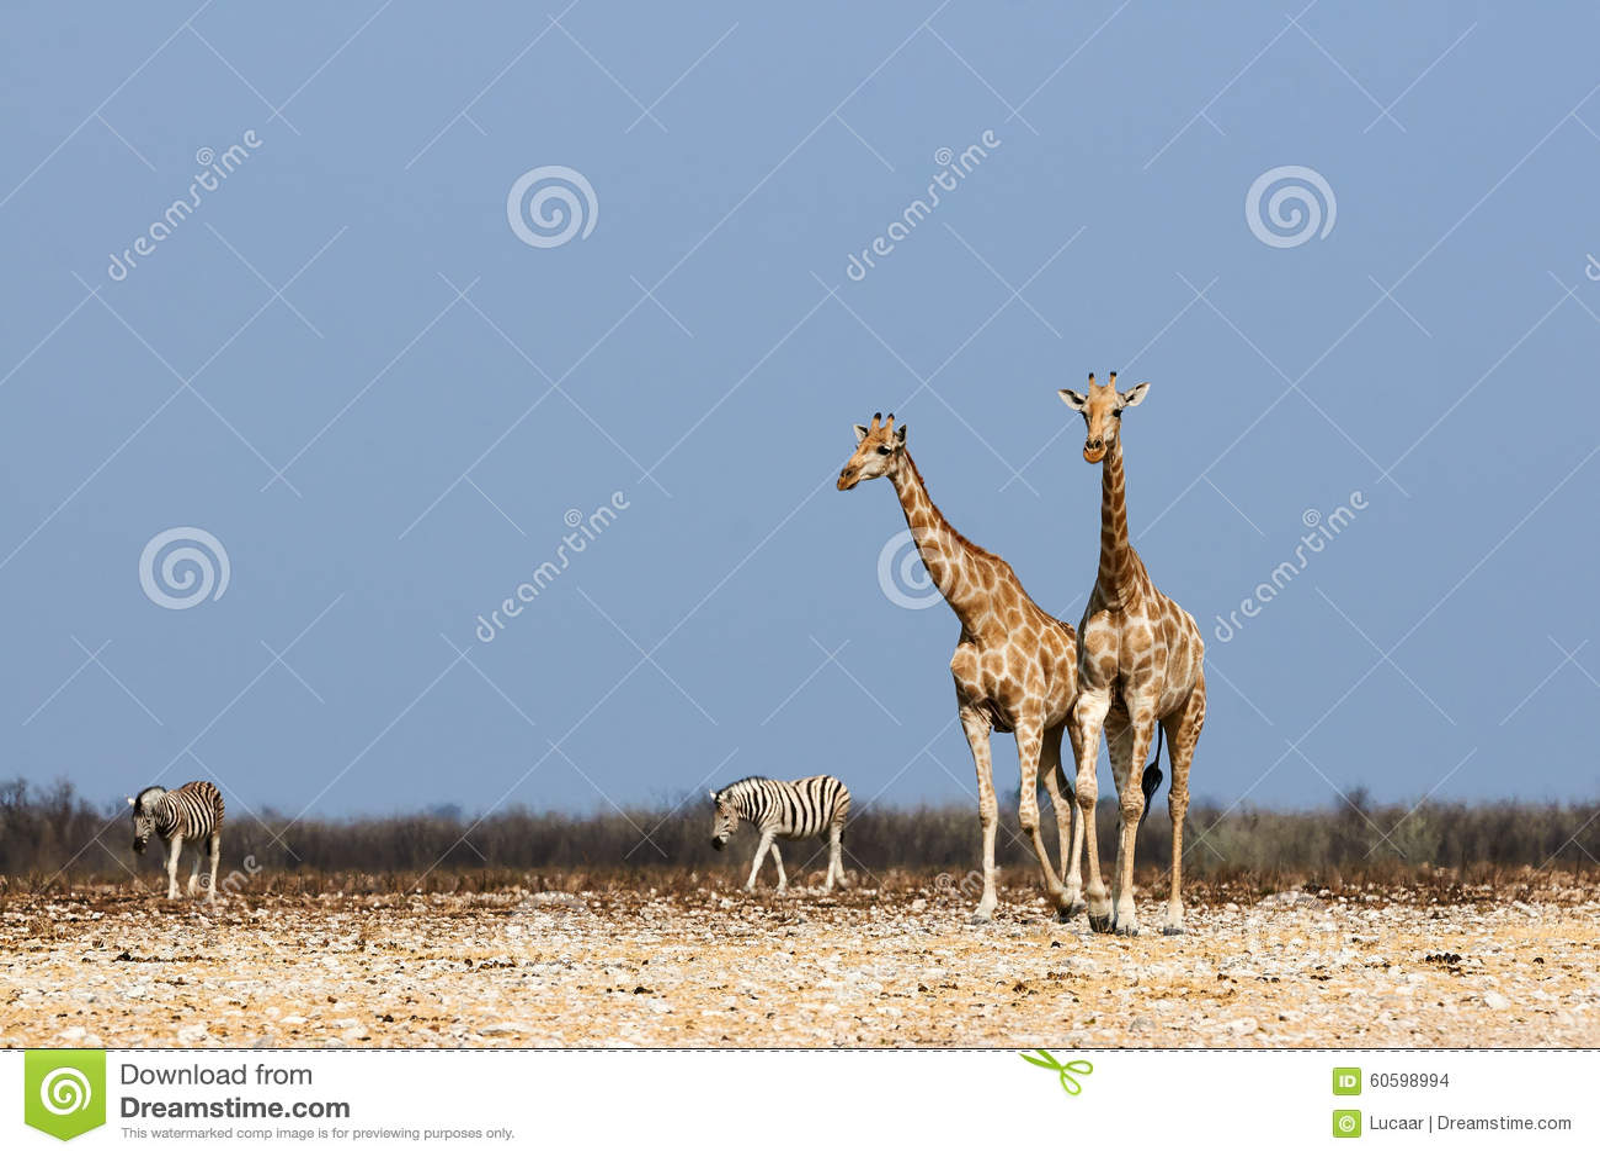 Giraffes And Zebras Stock Photo Image Of Ecology Mammal